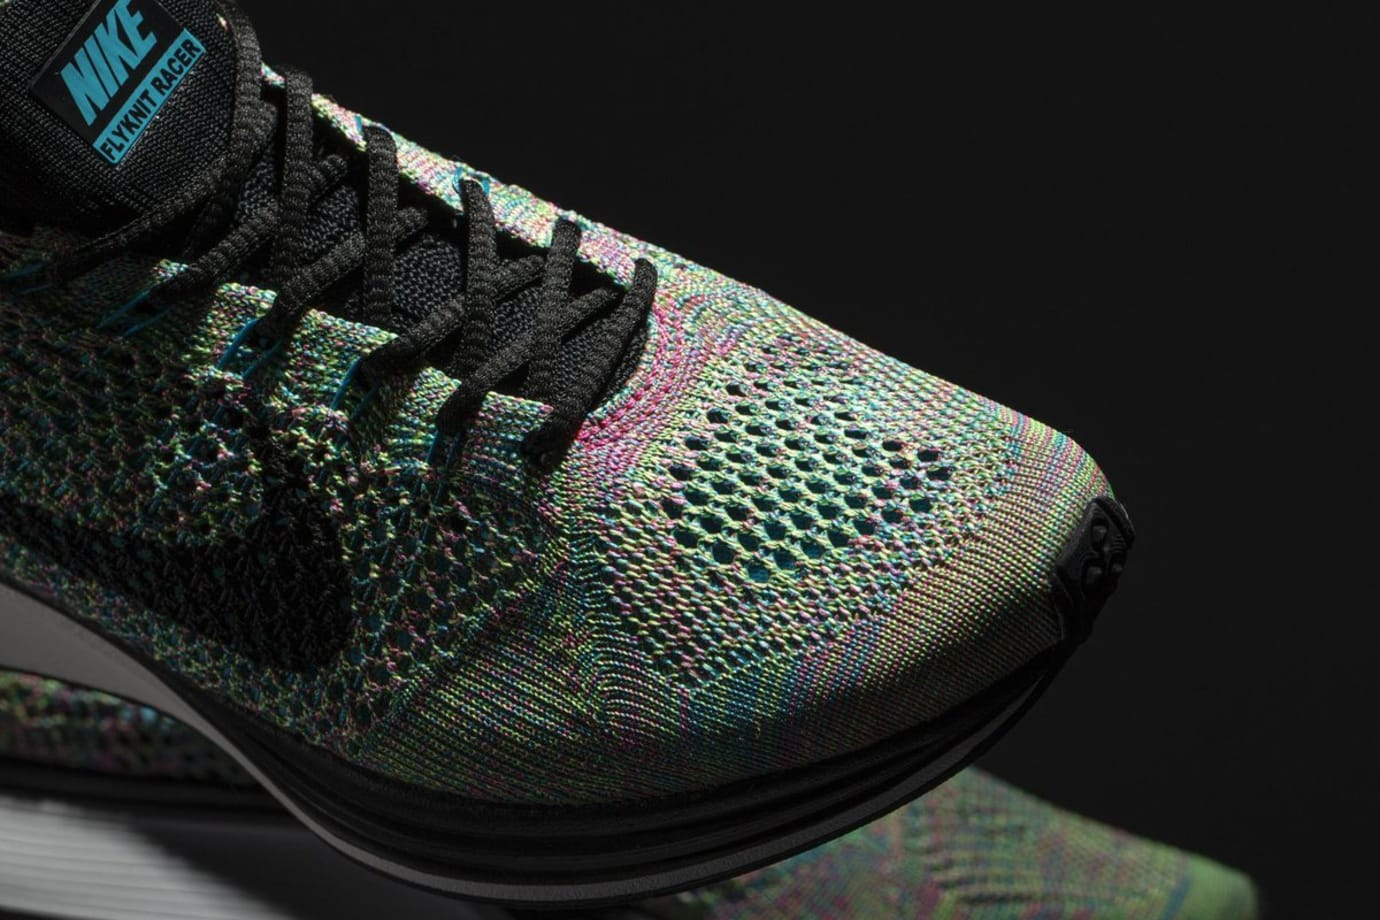 Multicolor Nike Flyknit 2017 Tongue